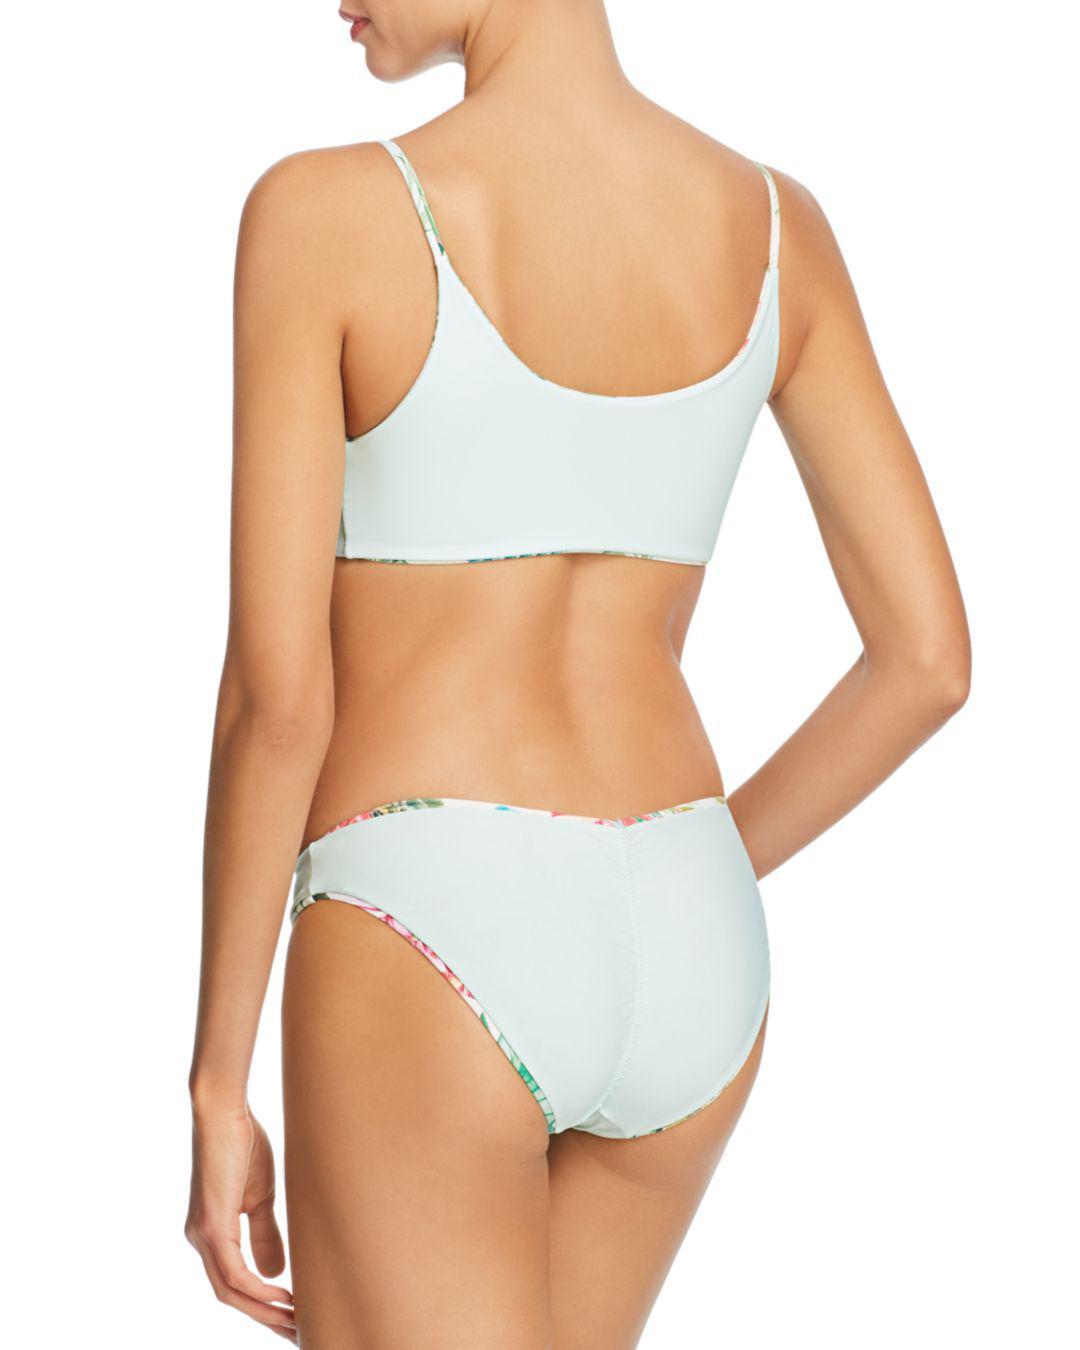 0699809fd5af1 Pilyq - Green Tulum Basic Reversible Andrea Tie Bikini Top - Lyst. View  fullscreen